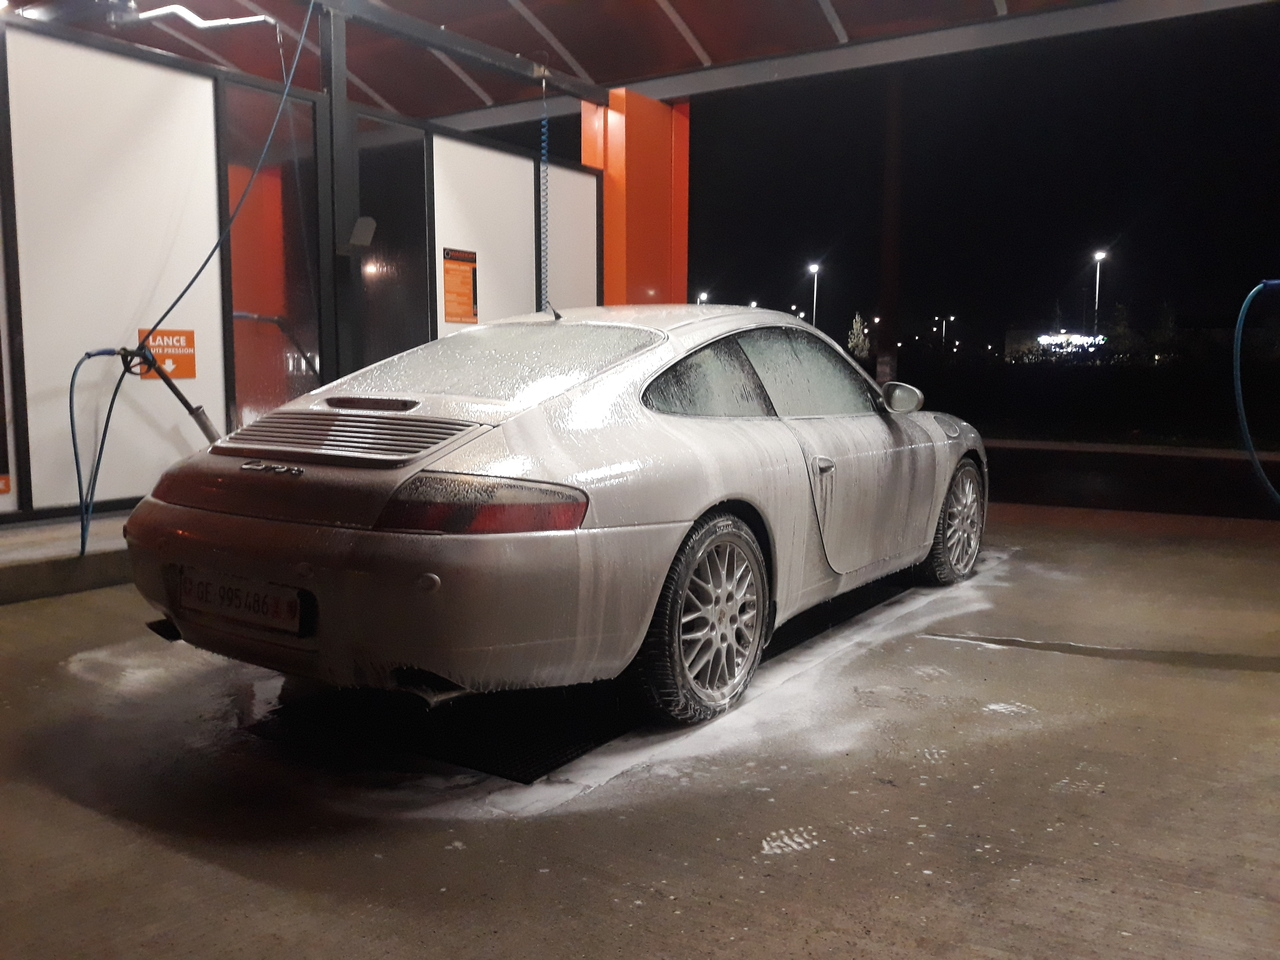 Khachou - Porsche 996 C2 - Page 2 190318021745585114